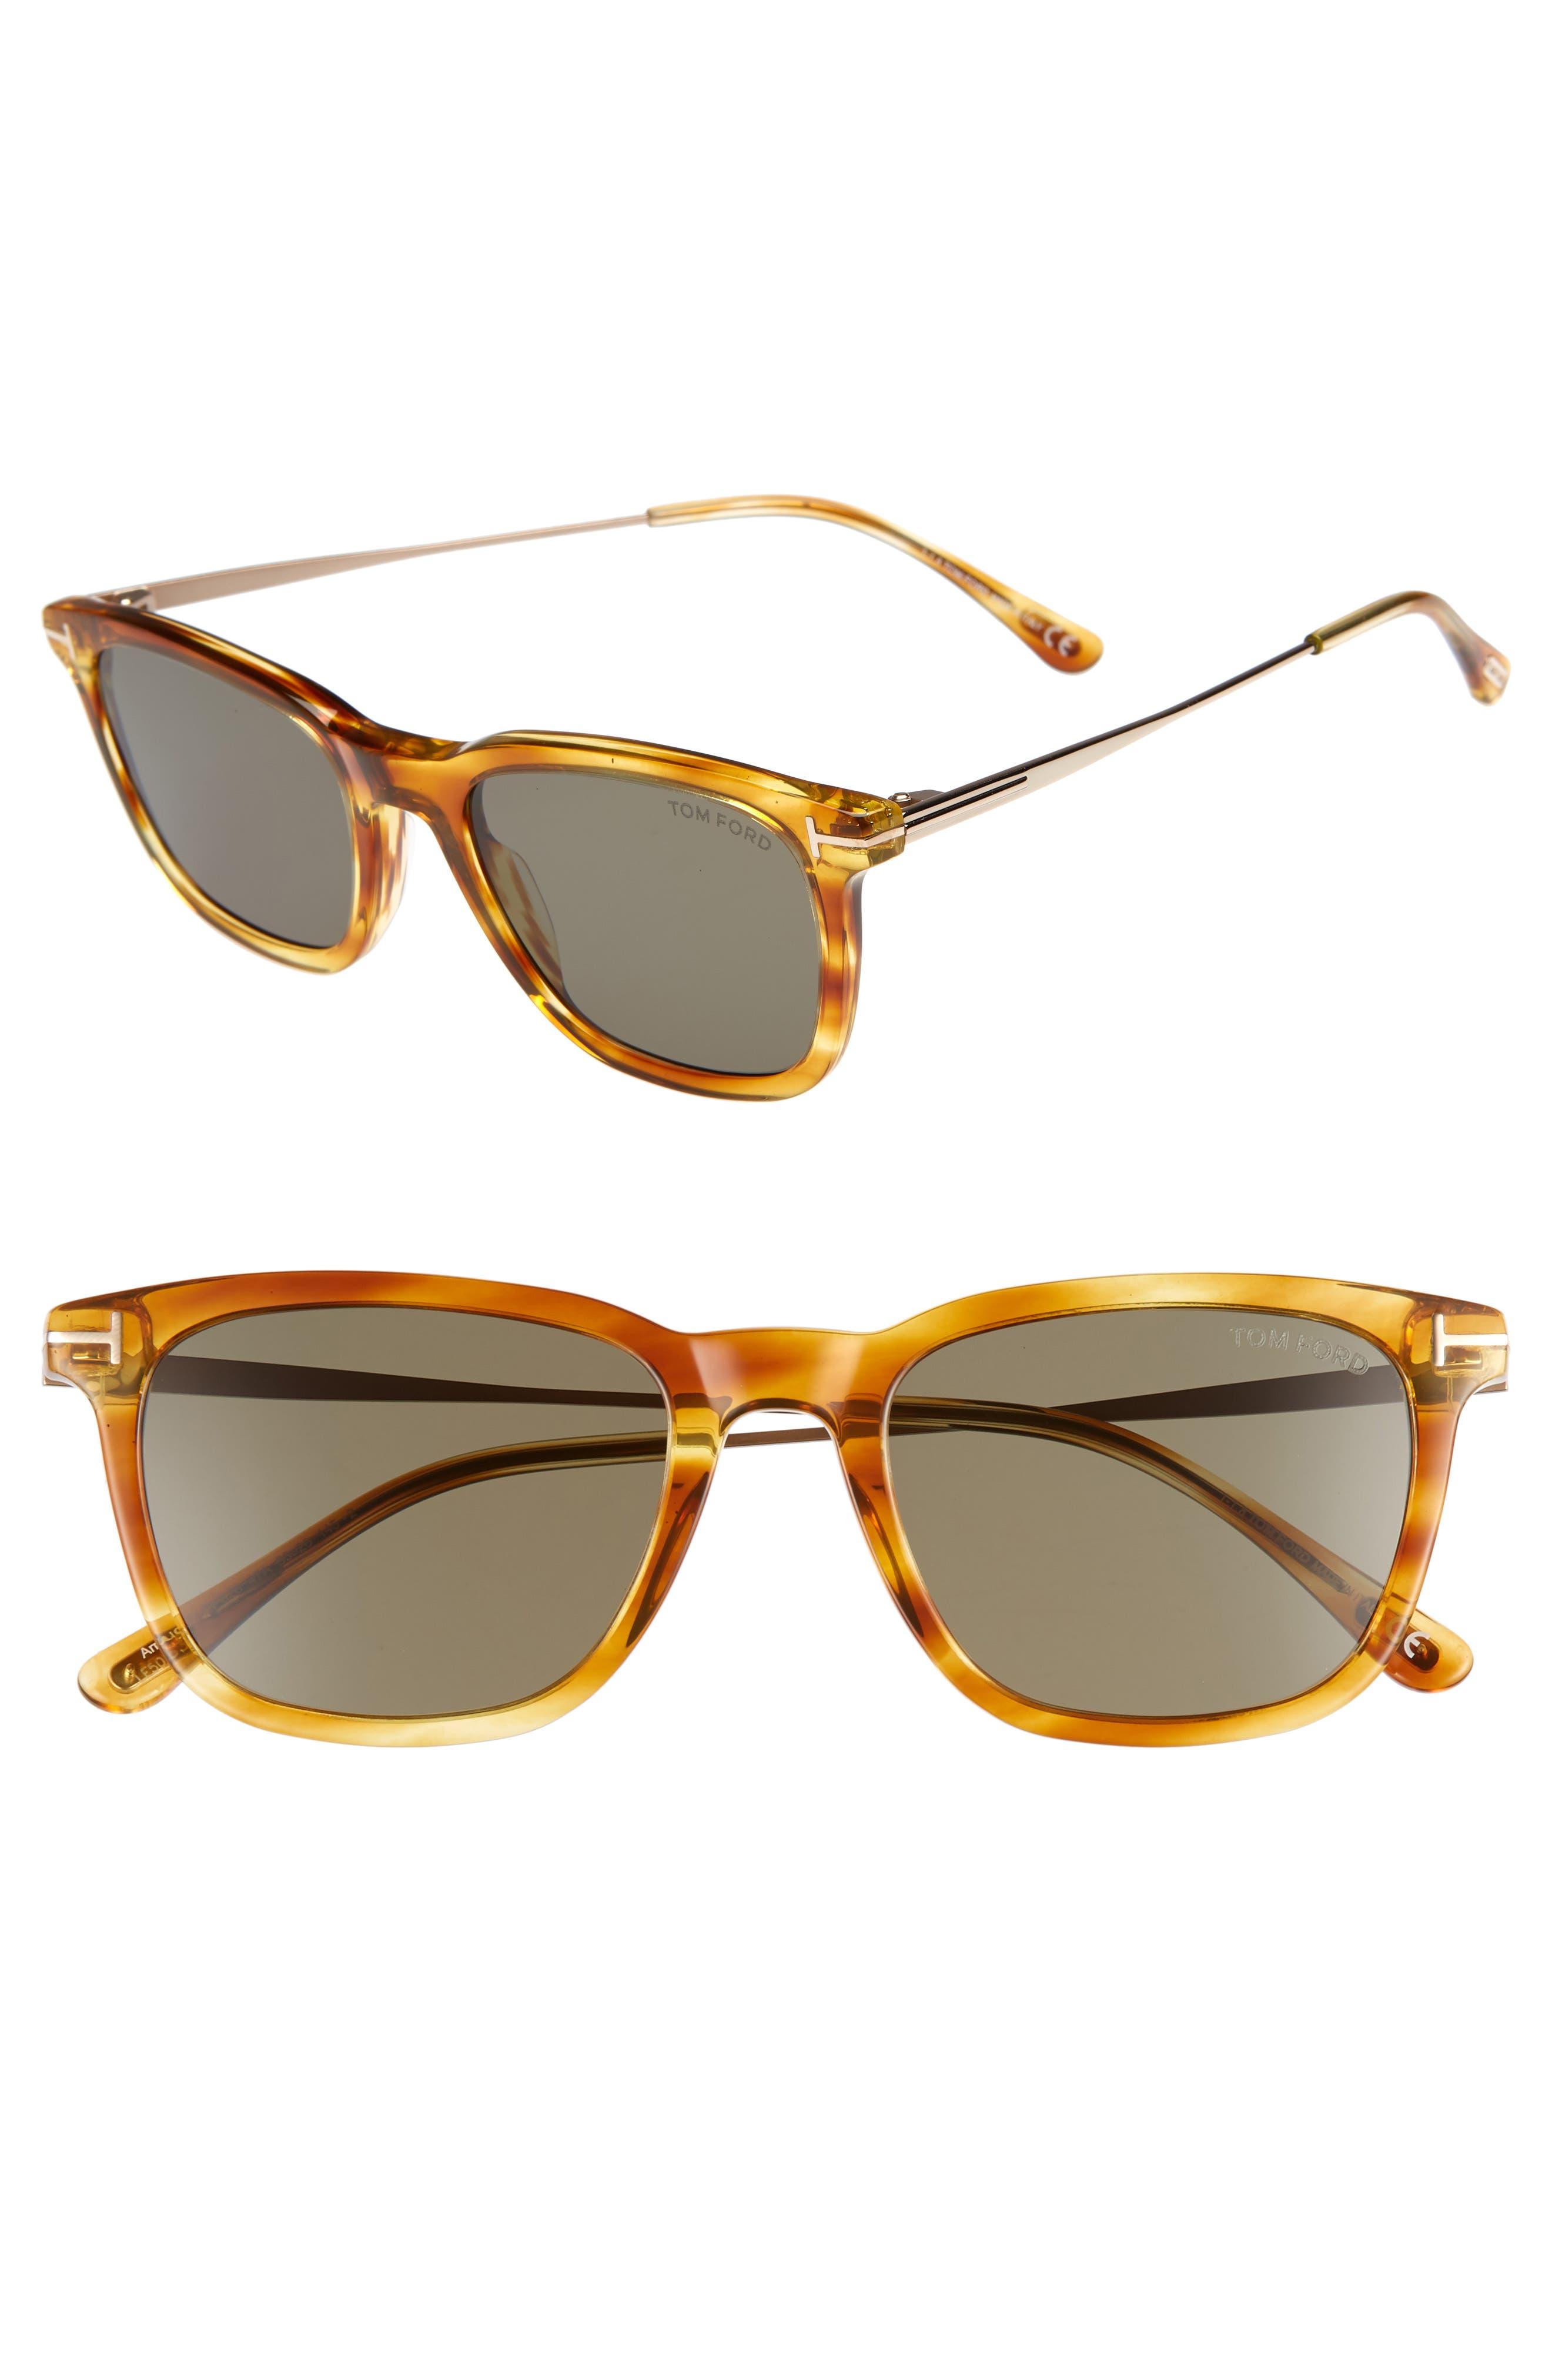 Tom Ford 5m Rectangle Sunglasses - Light Brown/ Smoke